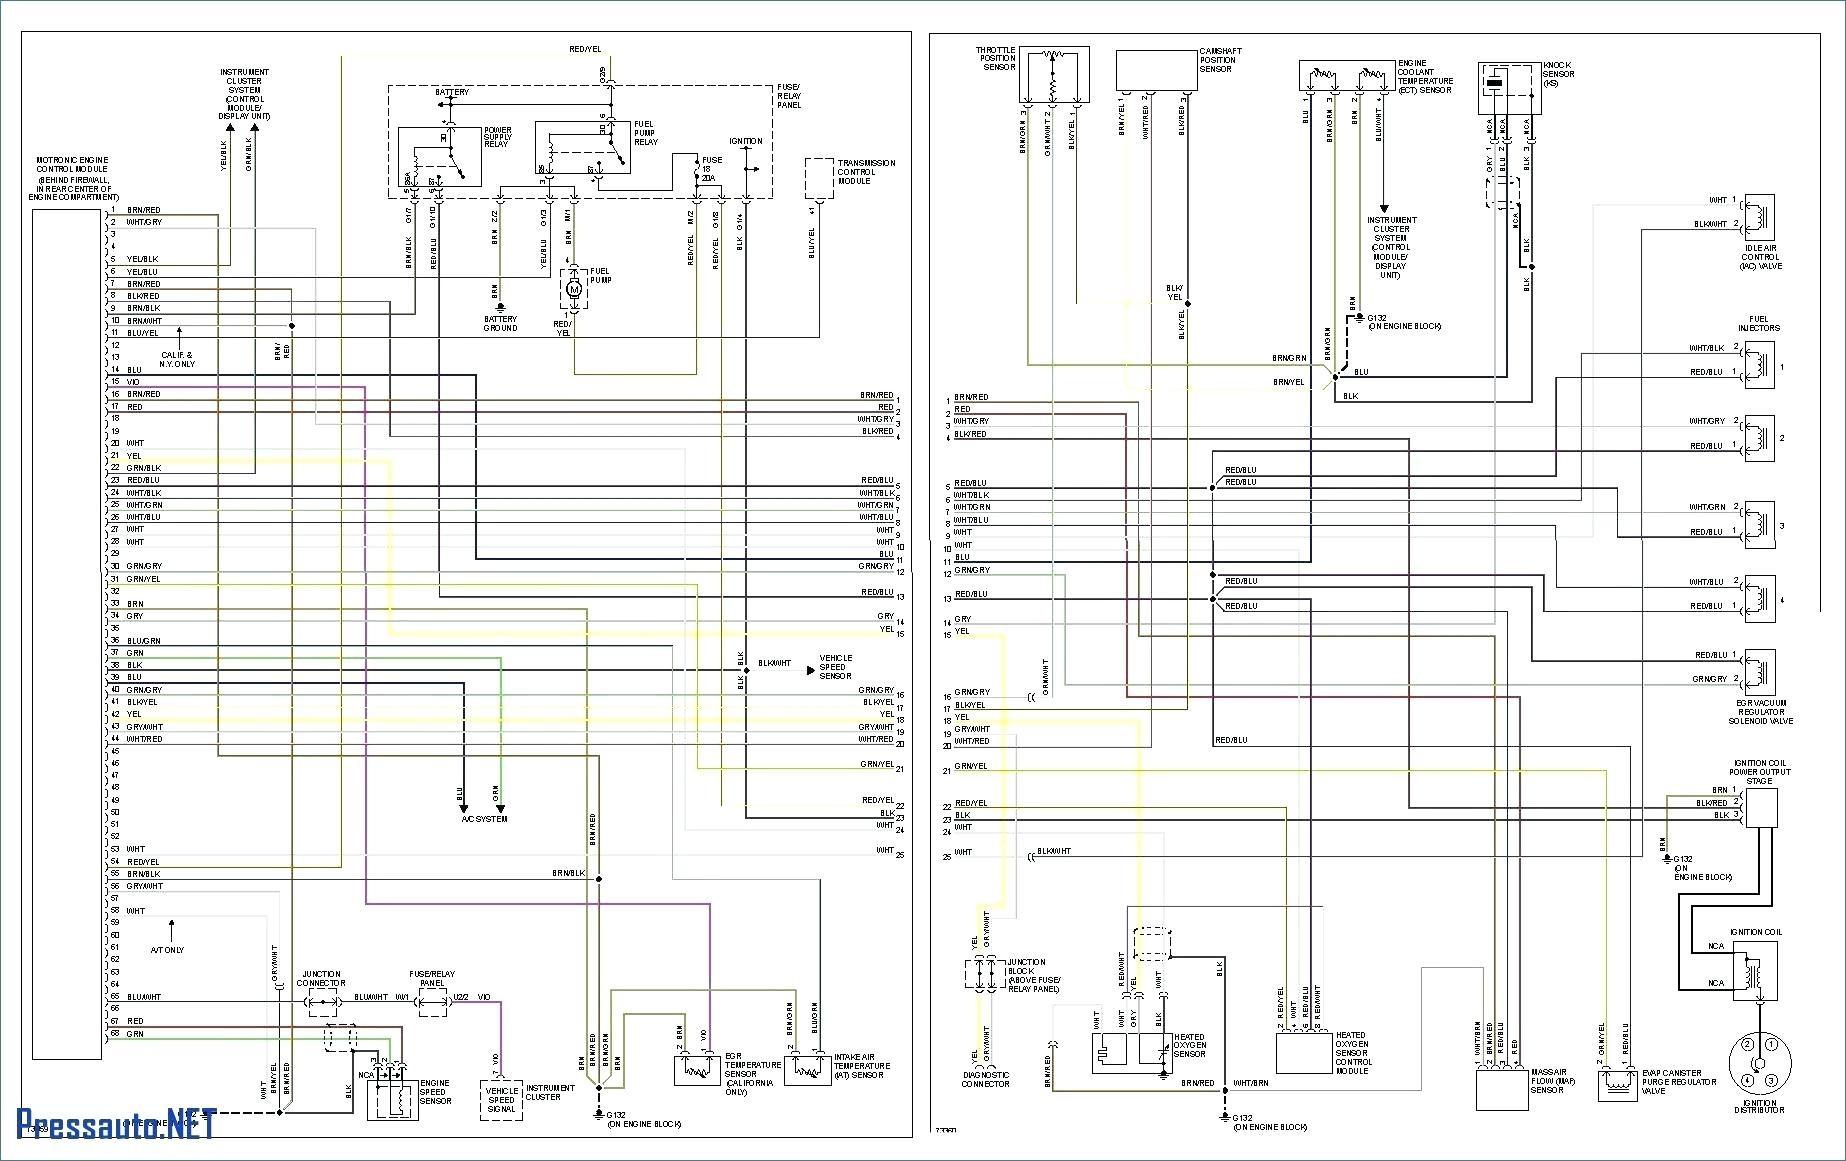 hight resolution of 2004 jetta engine diagram 2000 vw jetta tdi fuse box location diagram picture size of 2004